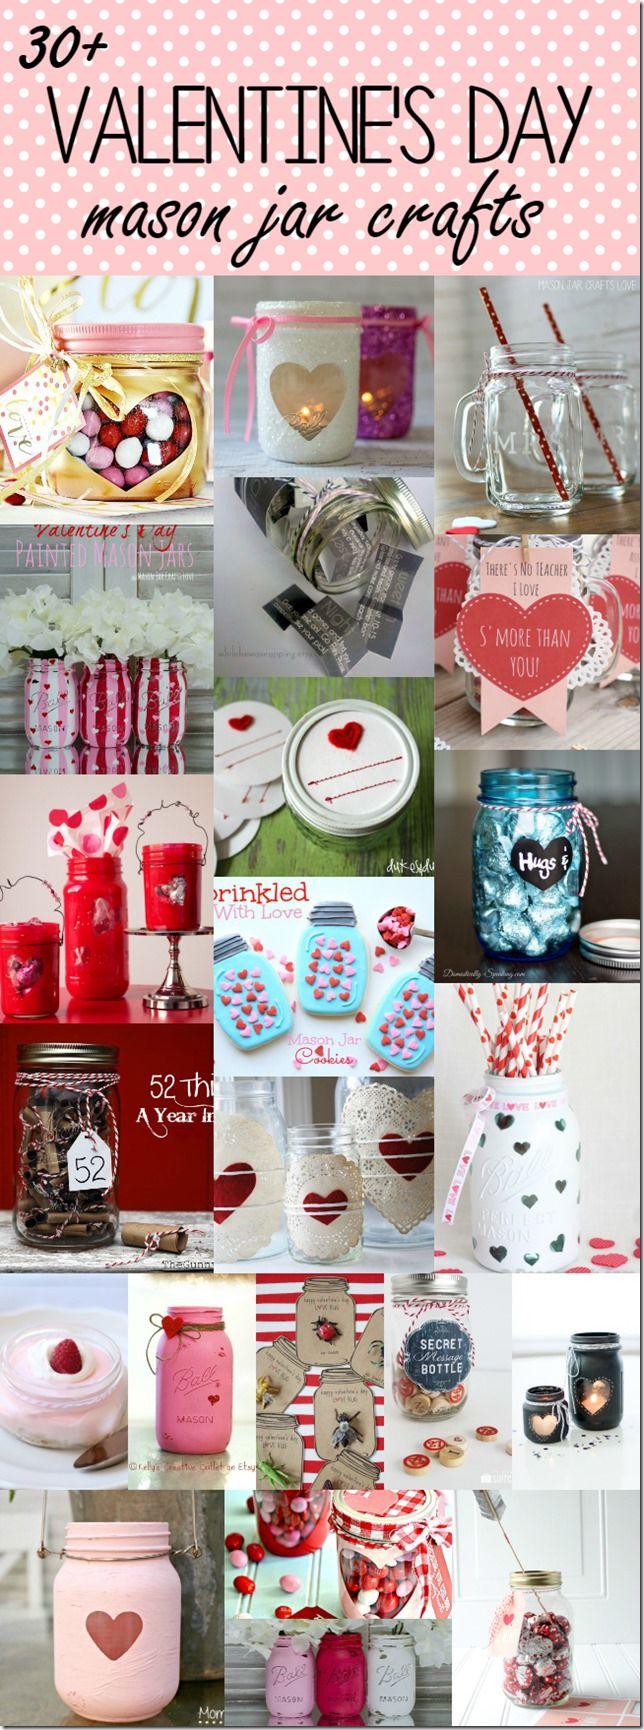 Valentine's Day Crafts & Gift Ideas Using Mason Jars - 30+ Ideas